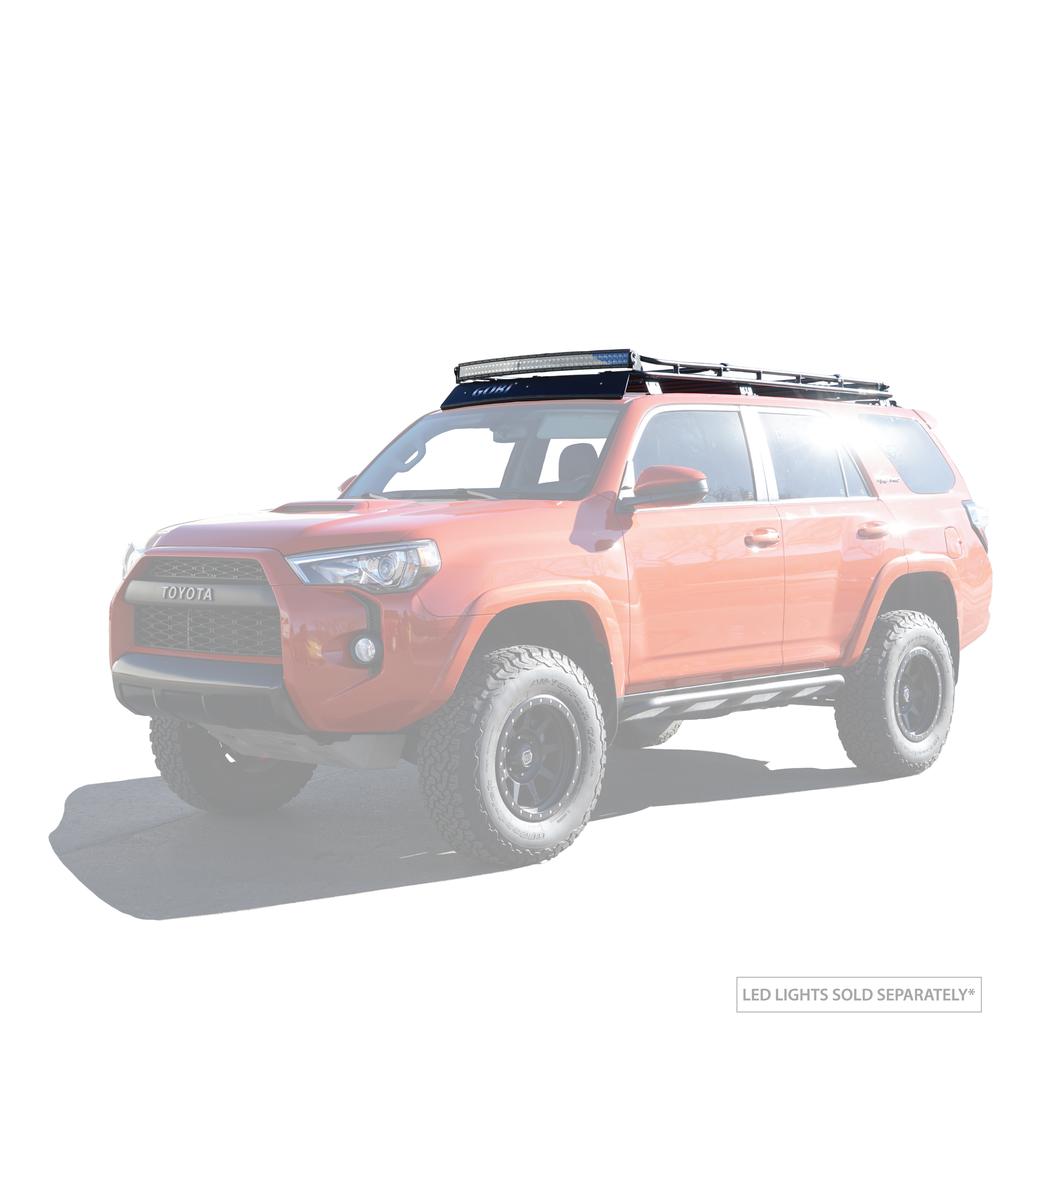 2019 Toyota Sequoia Towing Capacity Specs: GOBI Toyota 4Runner 5th GEN Stealth Rack Lightbar Setup